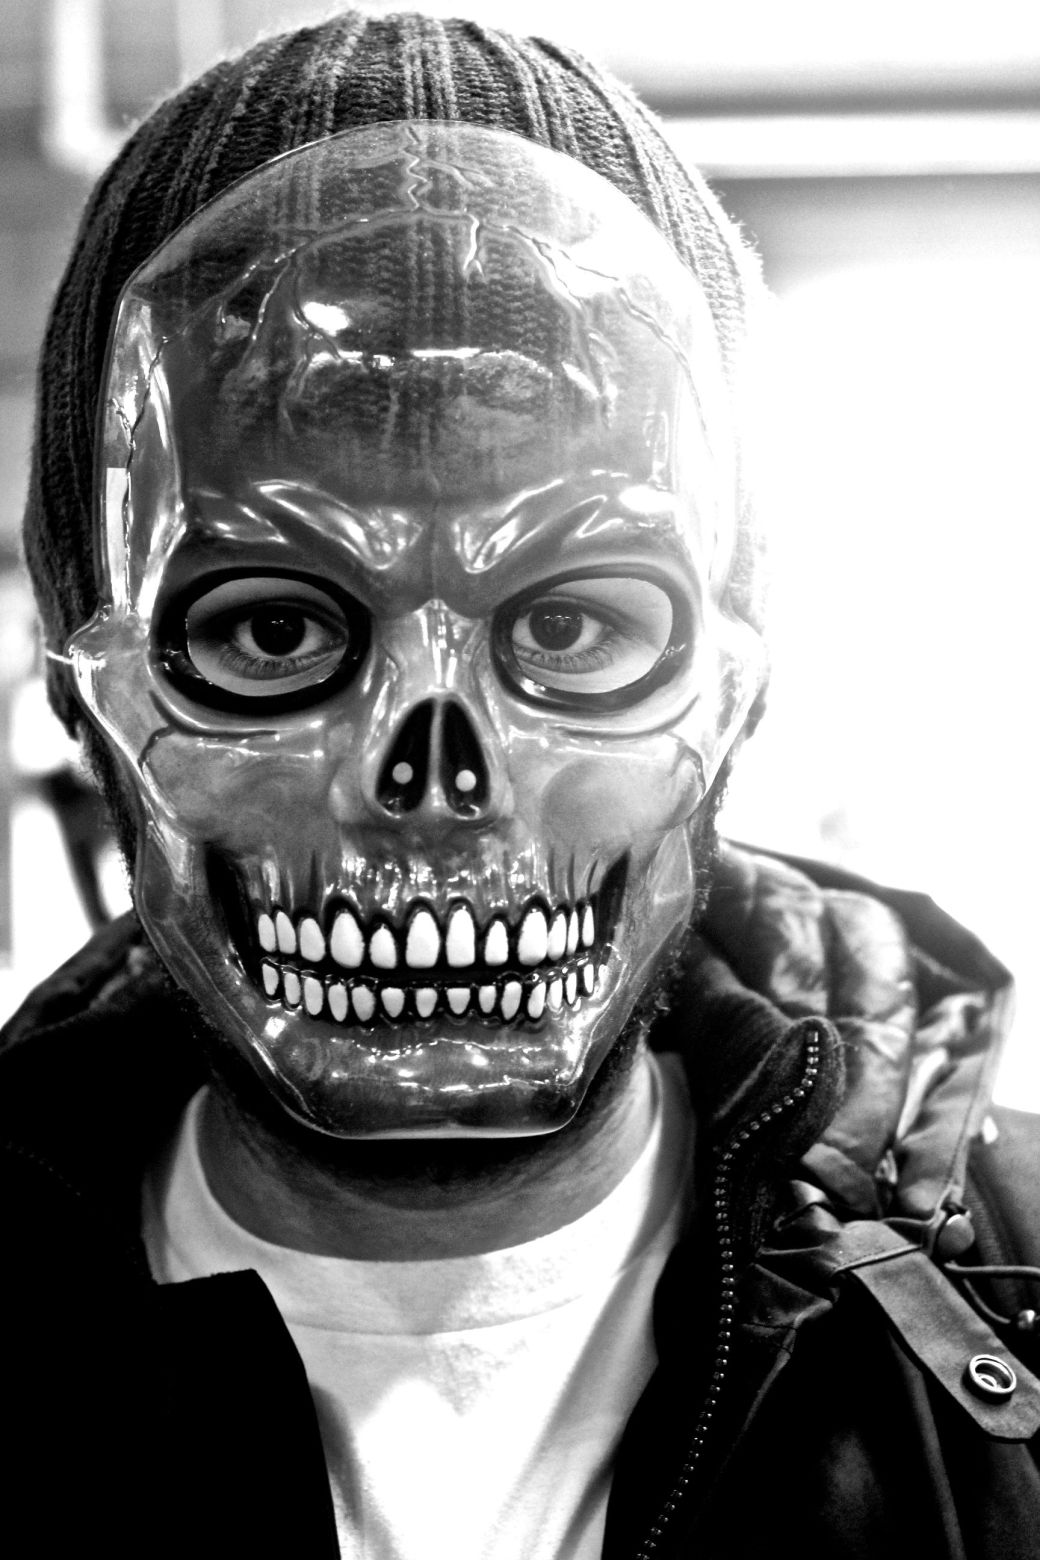 cambridge garment district friends with masks 2